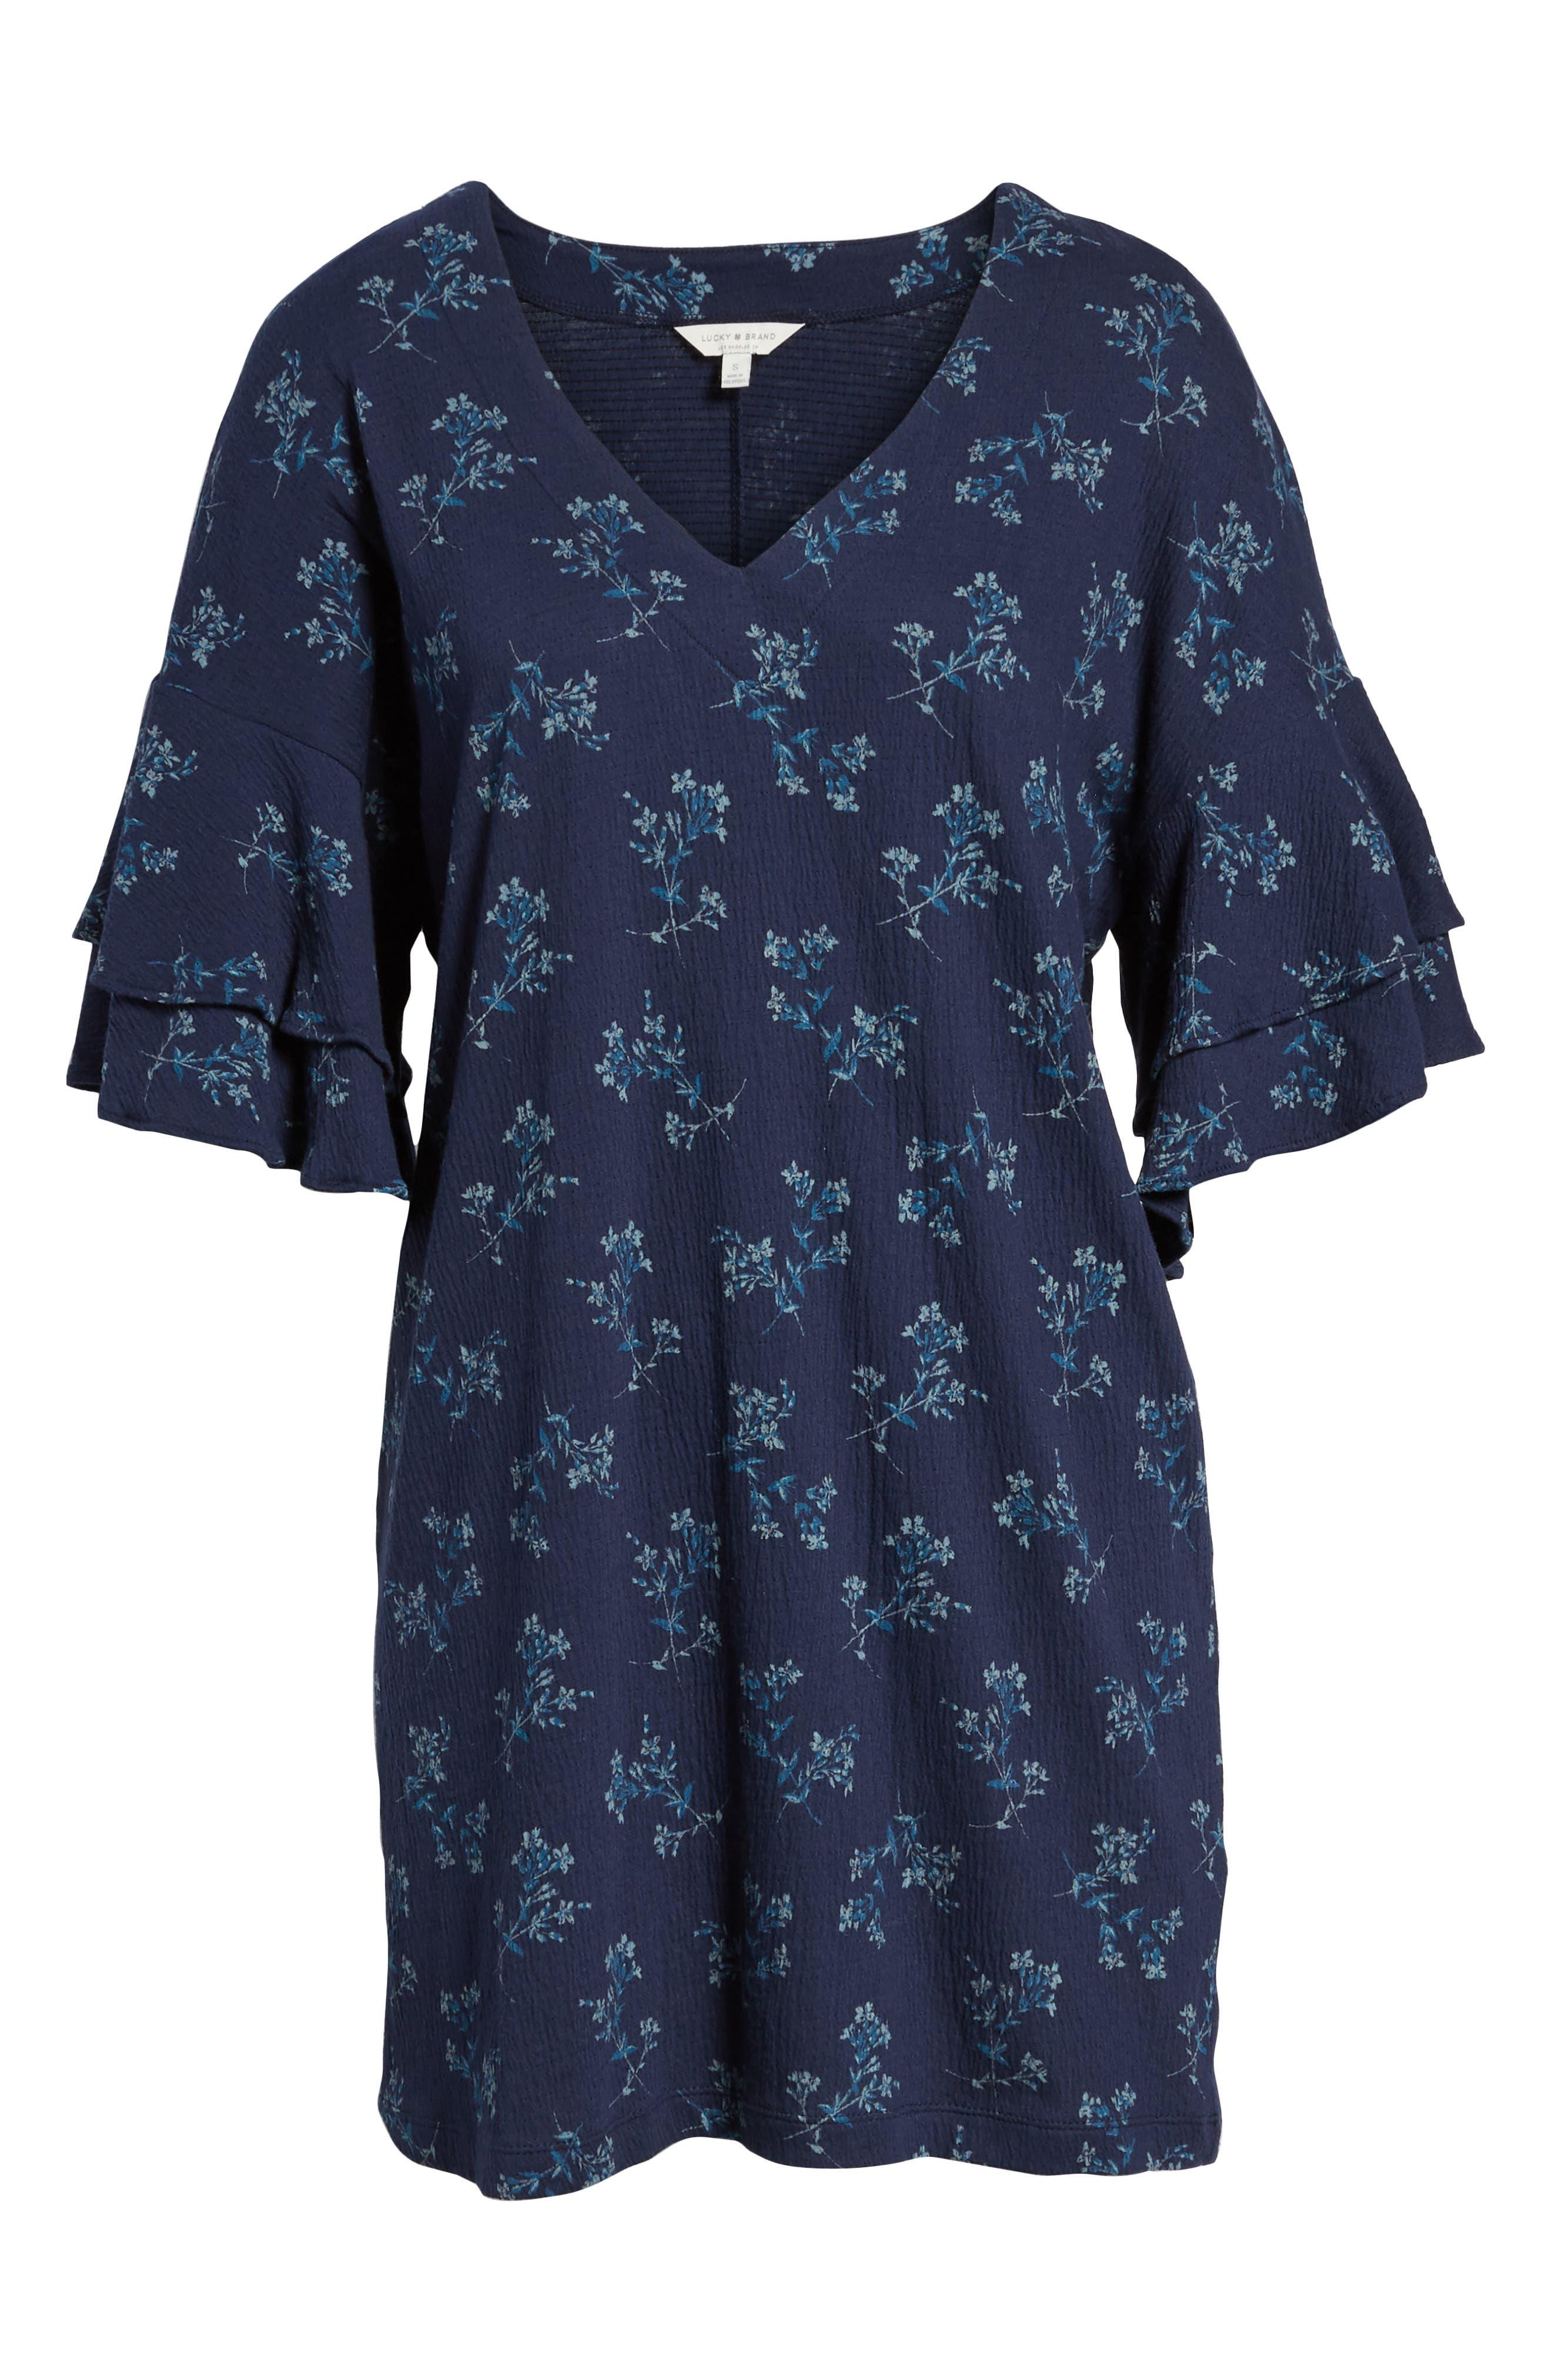 Tiered Sleeve Mini Dress,                             Alternate thumbnail 6, color,                             400